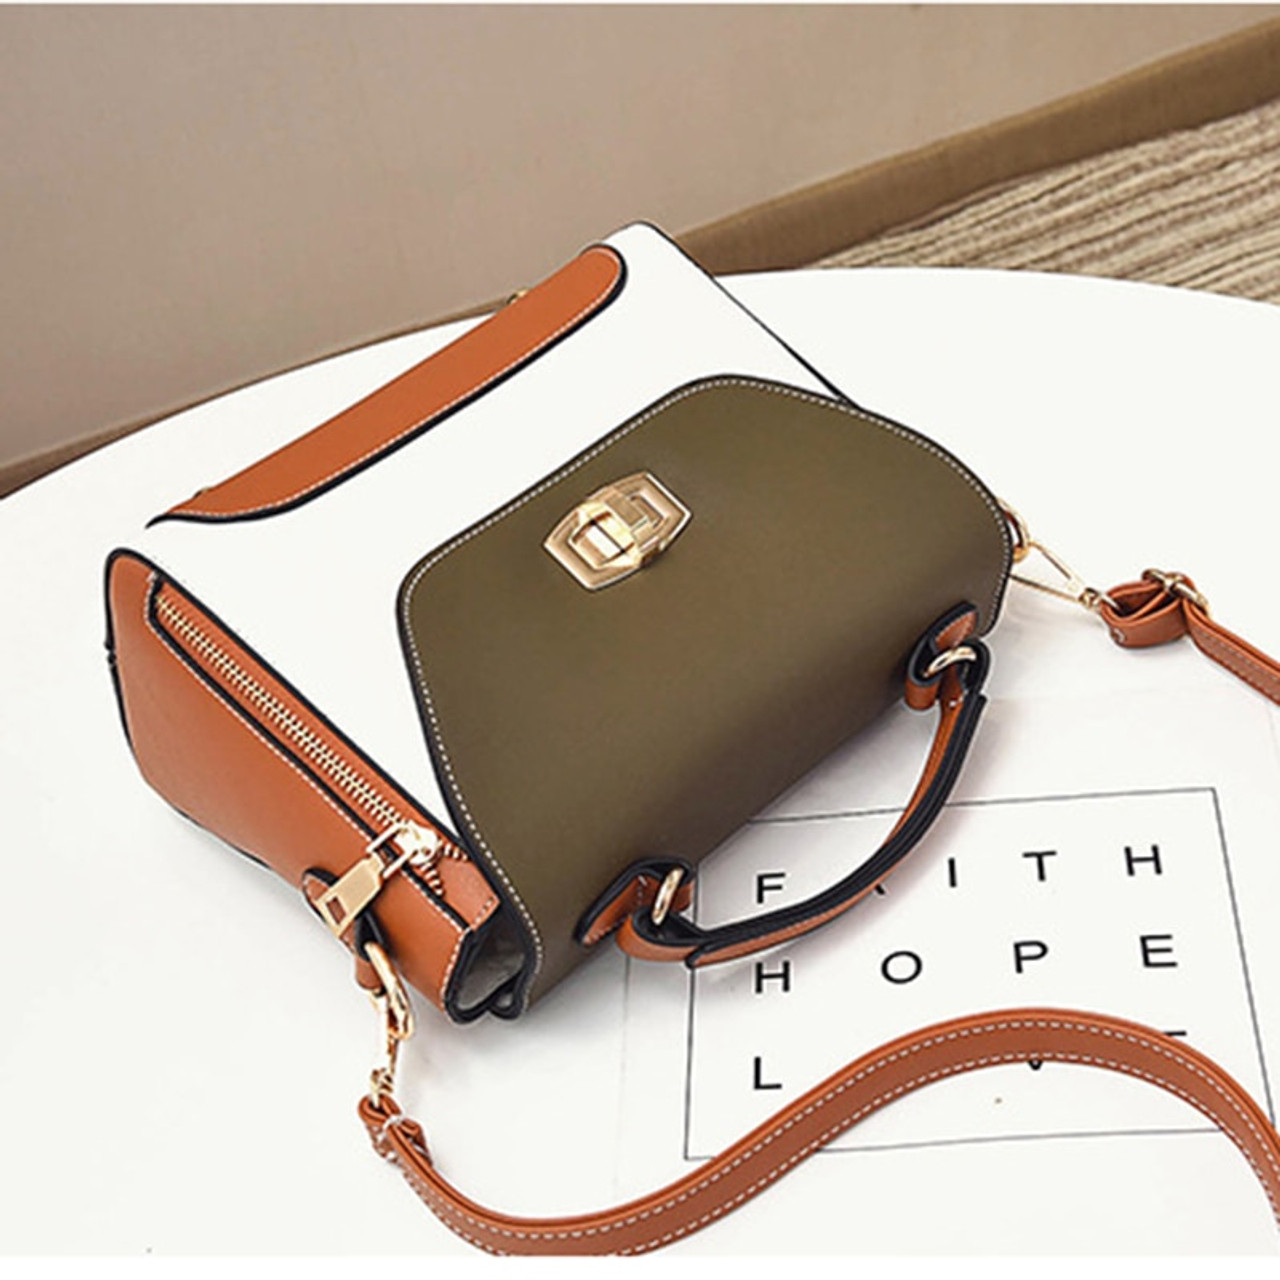 ... Women Handbags Fashion Women Messenger Bags Flap Crossbody Bag Hasp  Cute Shoulder Bolsa High Quality Small ... 4b0017e187016